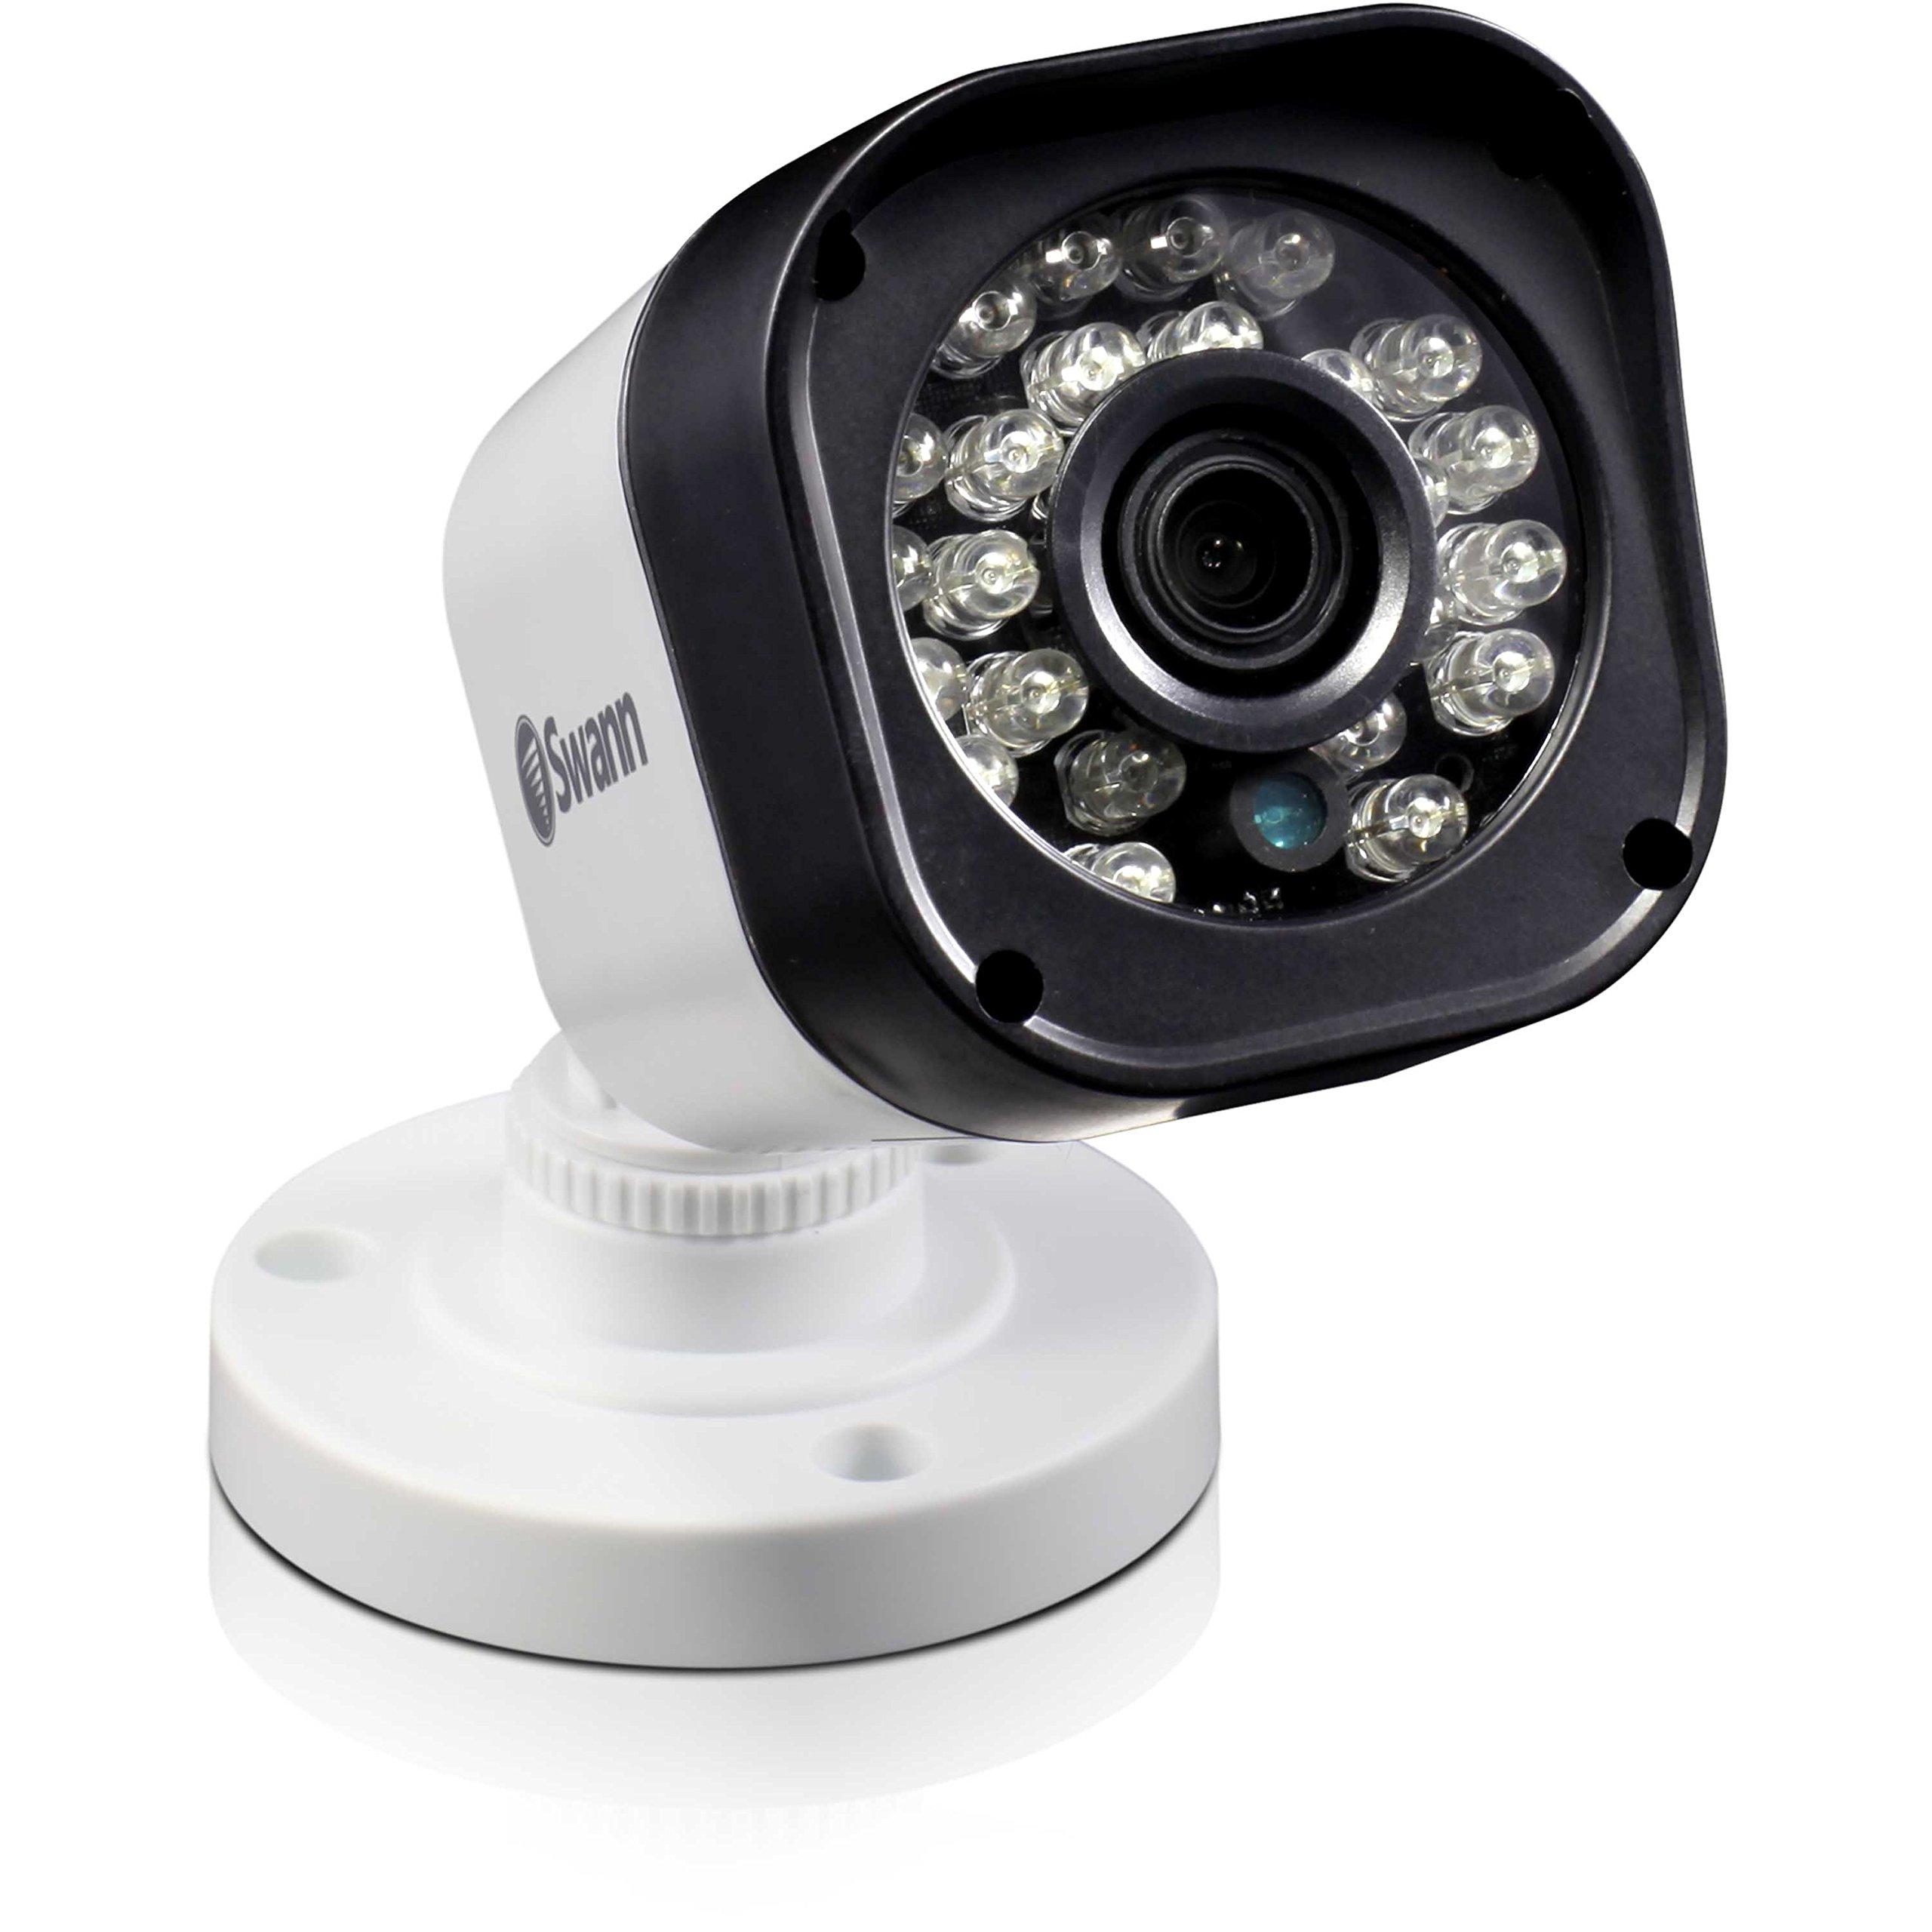 Swann T835 Bullet White Body/Black Trim 720P Camera (Item No.) by Swann